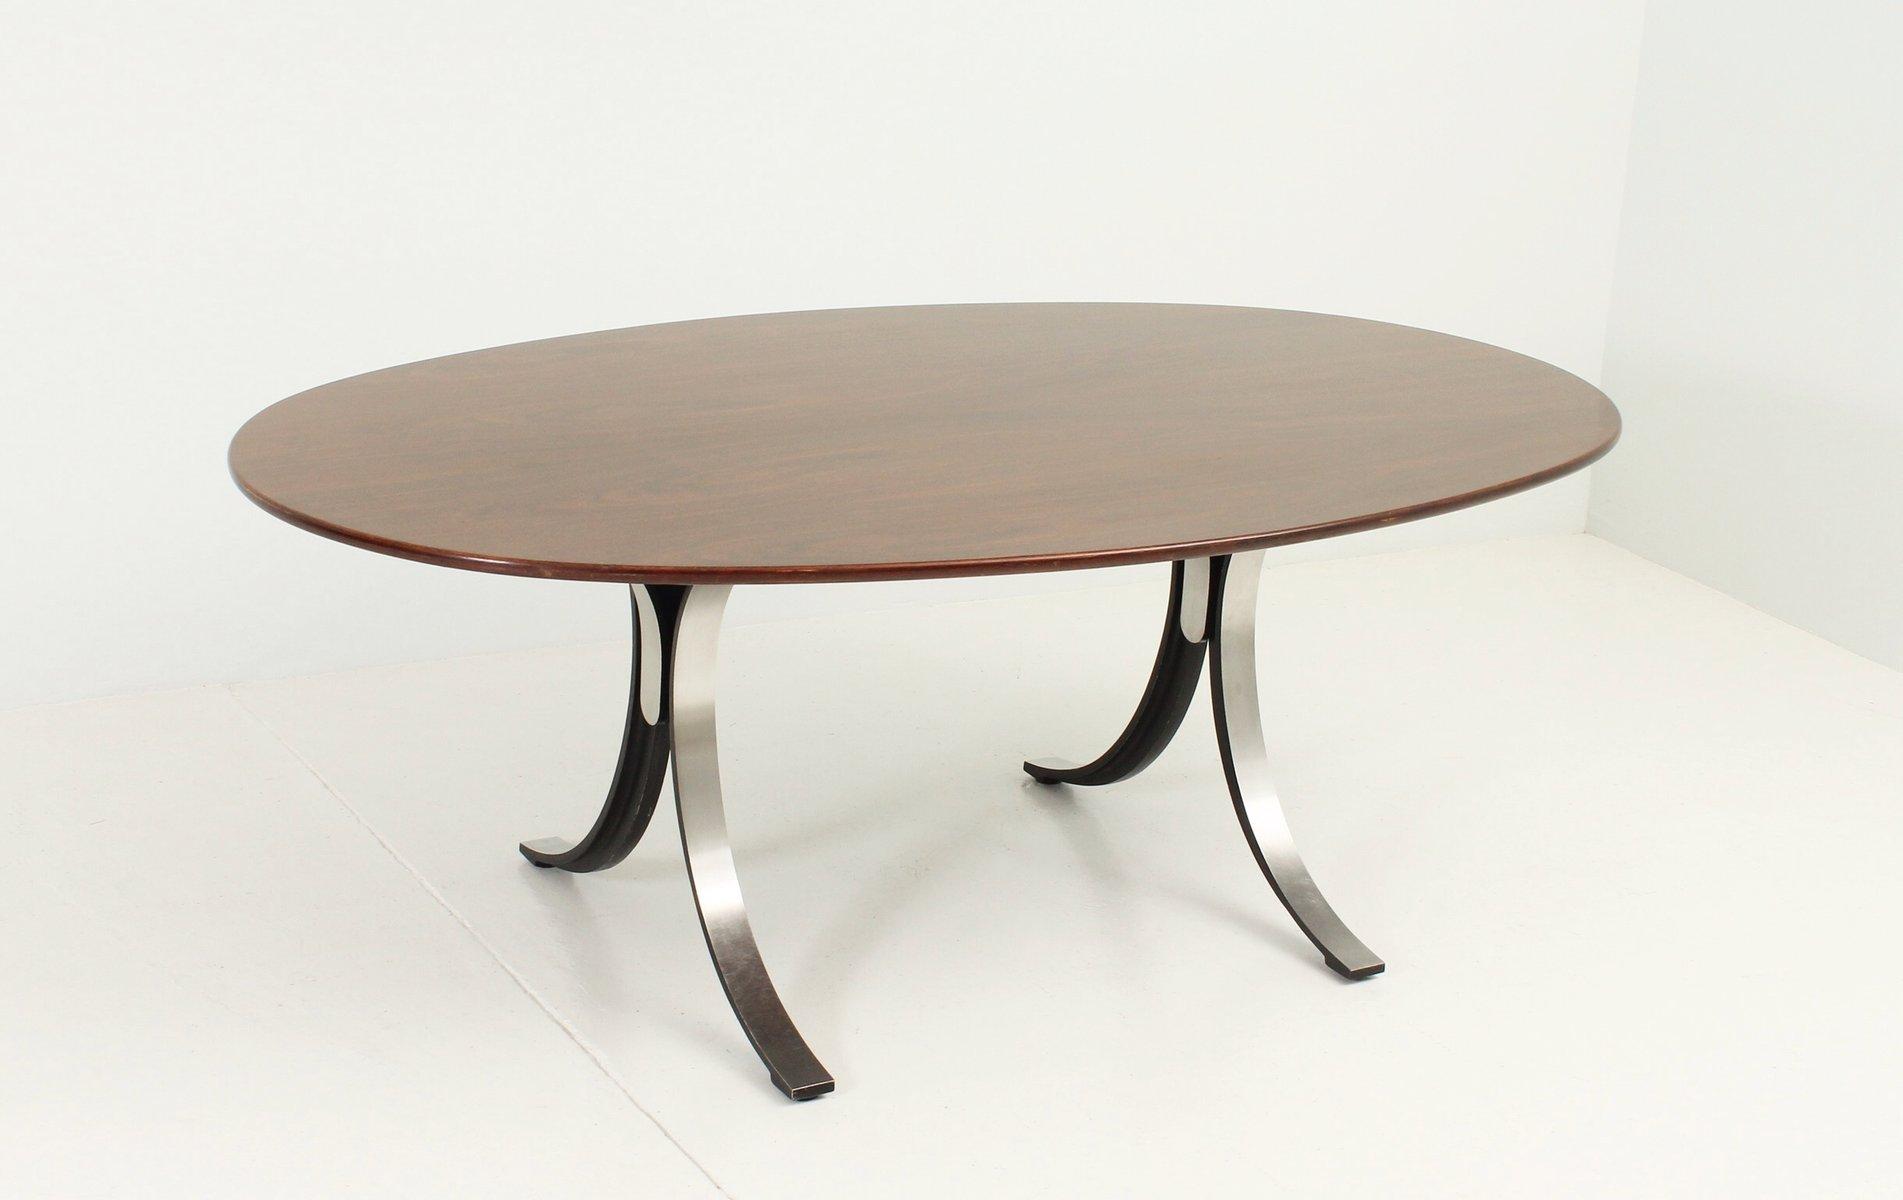 ovale tische container oval table top bodhi tisch moooi with ovale tische latest esstisch glas. Black Bedroom Furniture Sets. Home Design Ideas